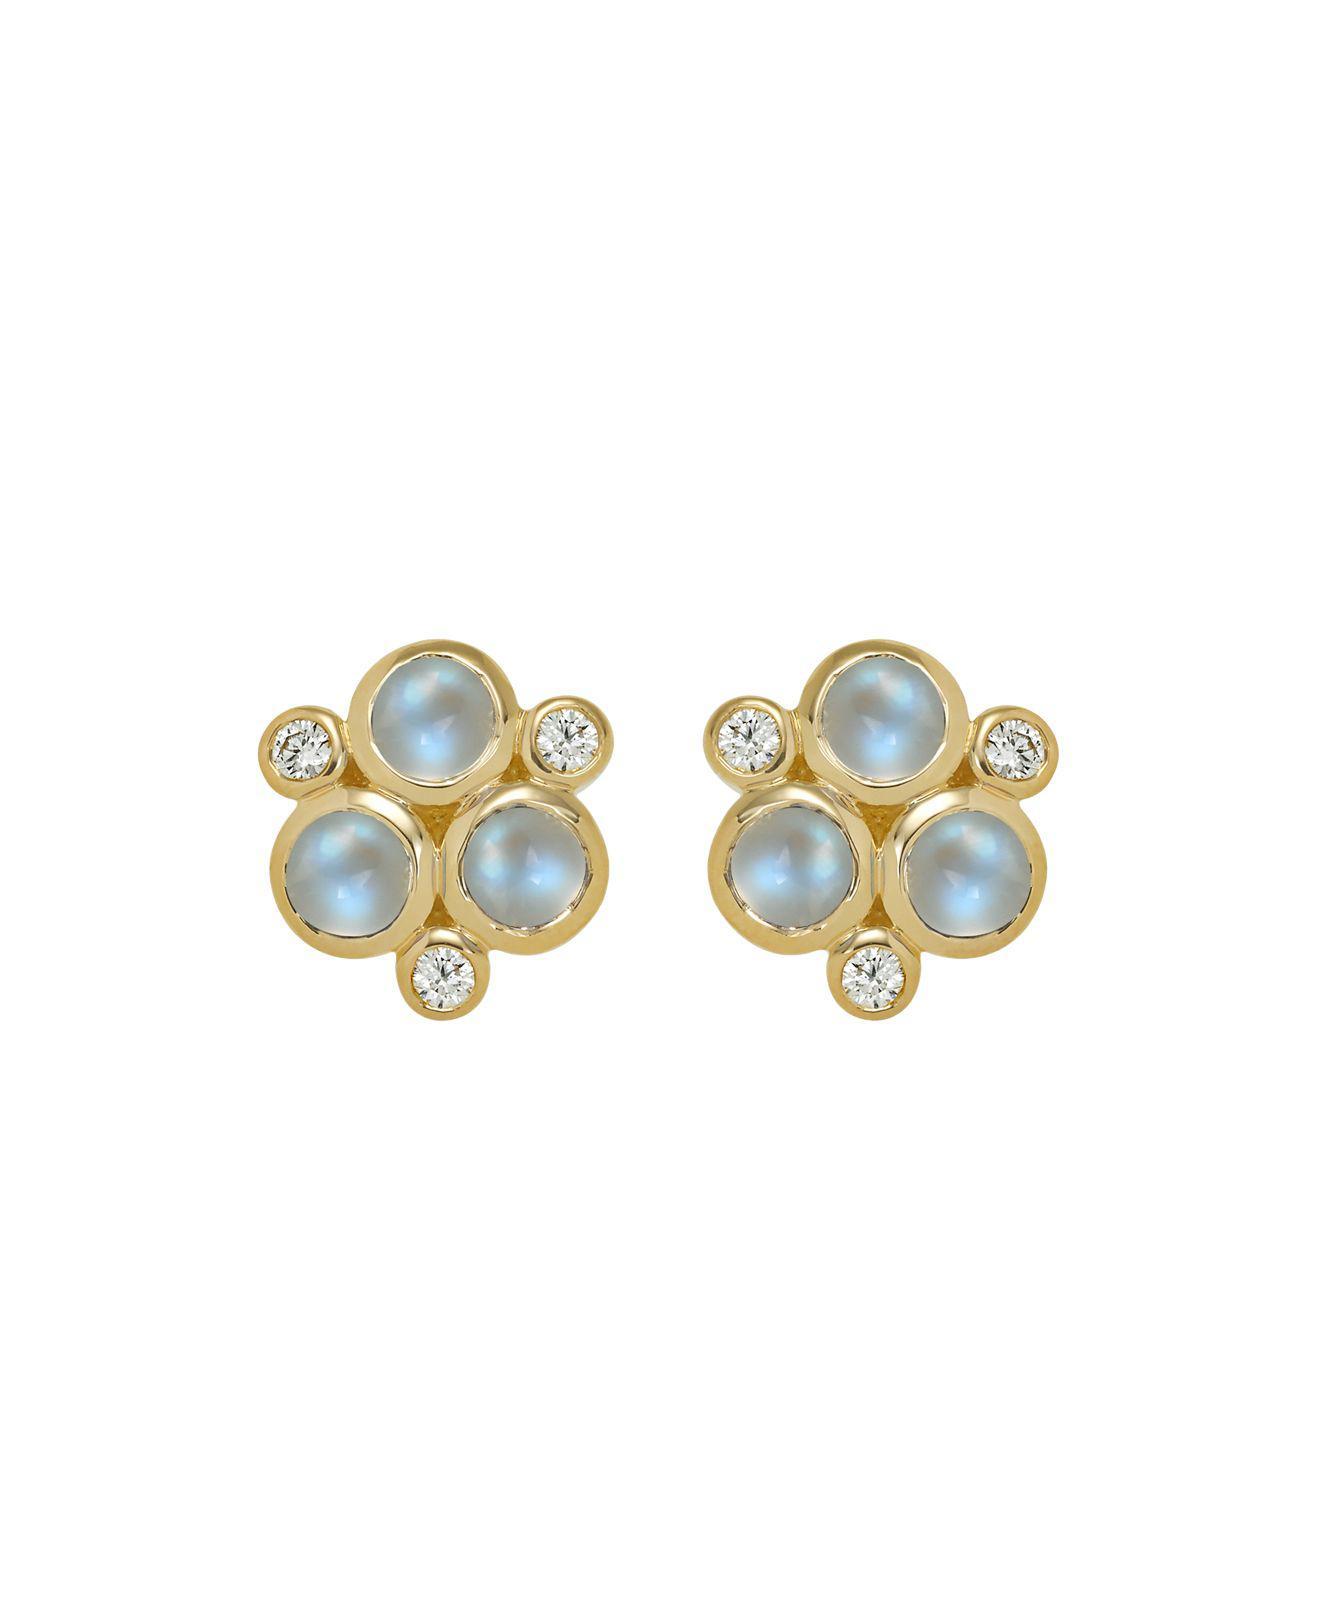 Temple St. Clair Estate Trio Moonstone & Diamond Earrings P4YOV79